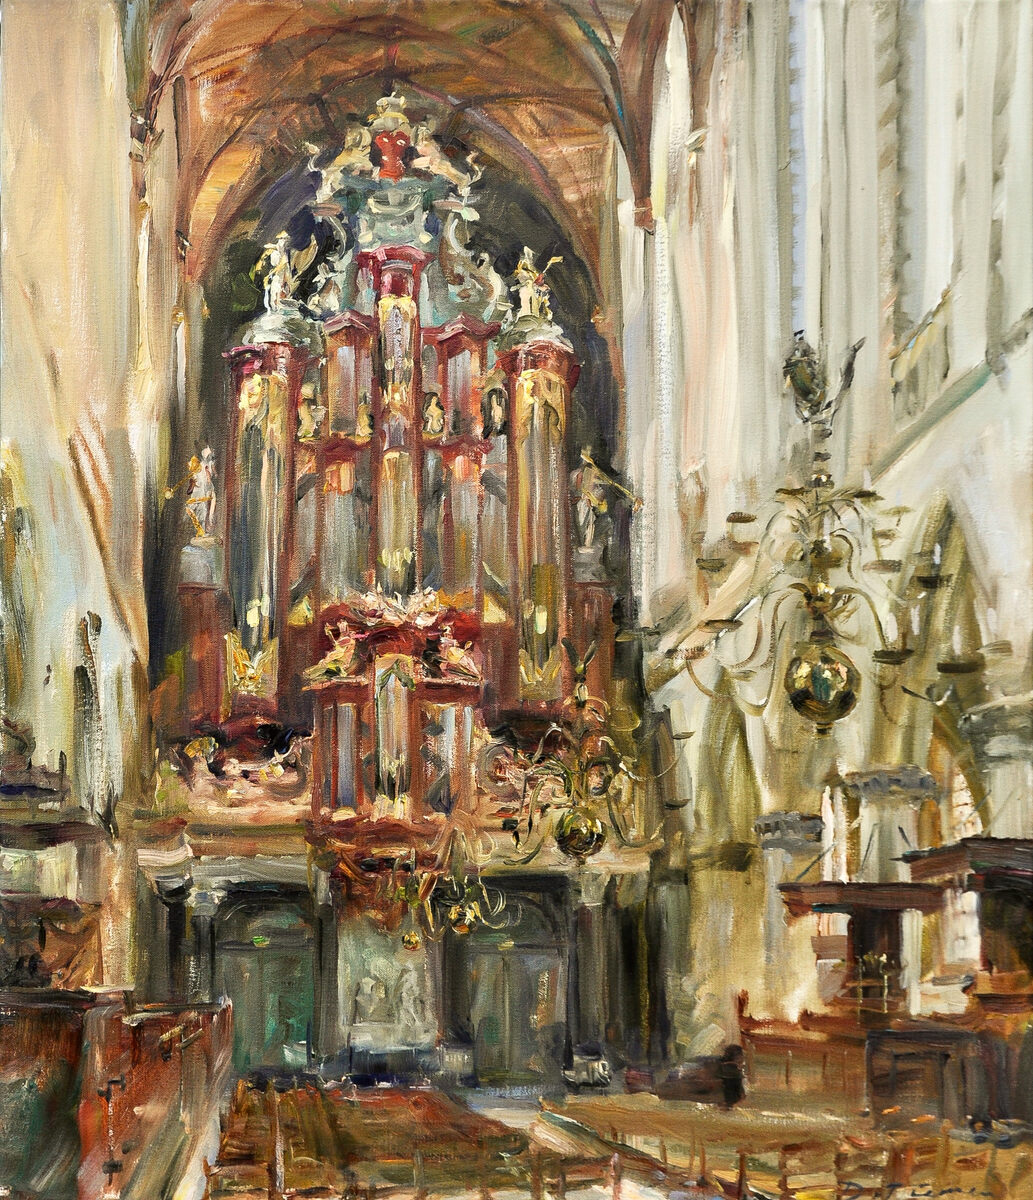 Dorien van Diemen, 'Müller orgel, st Bavokerk Haarlem' , Müller orgel, st Bavokerk Haarlem, olieverf / doek 70 x 60 cm.